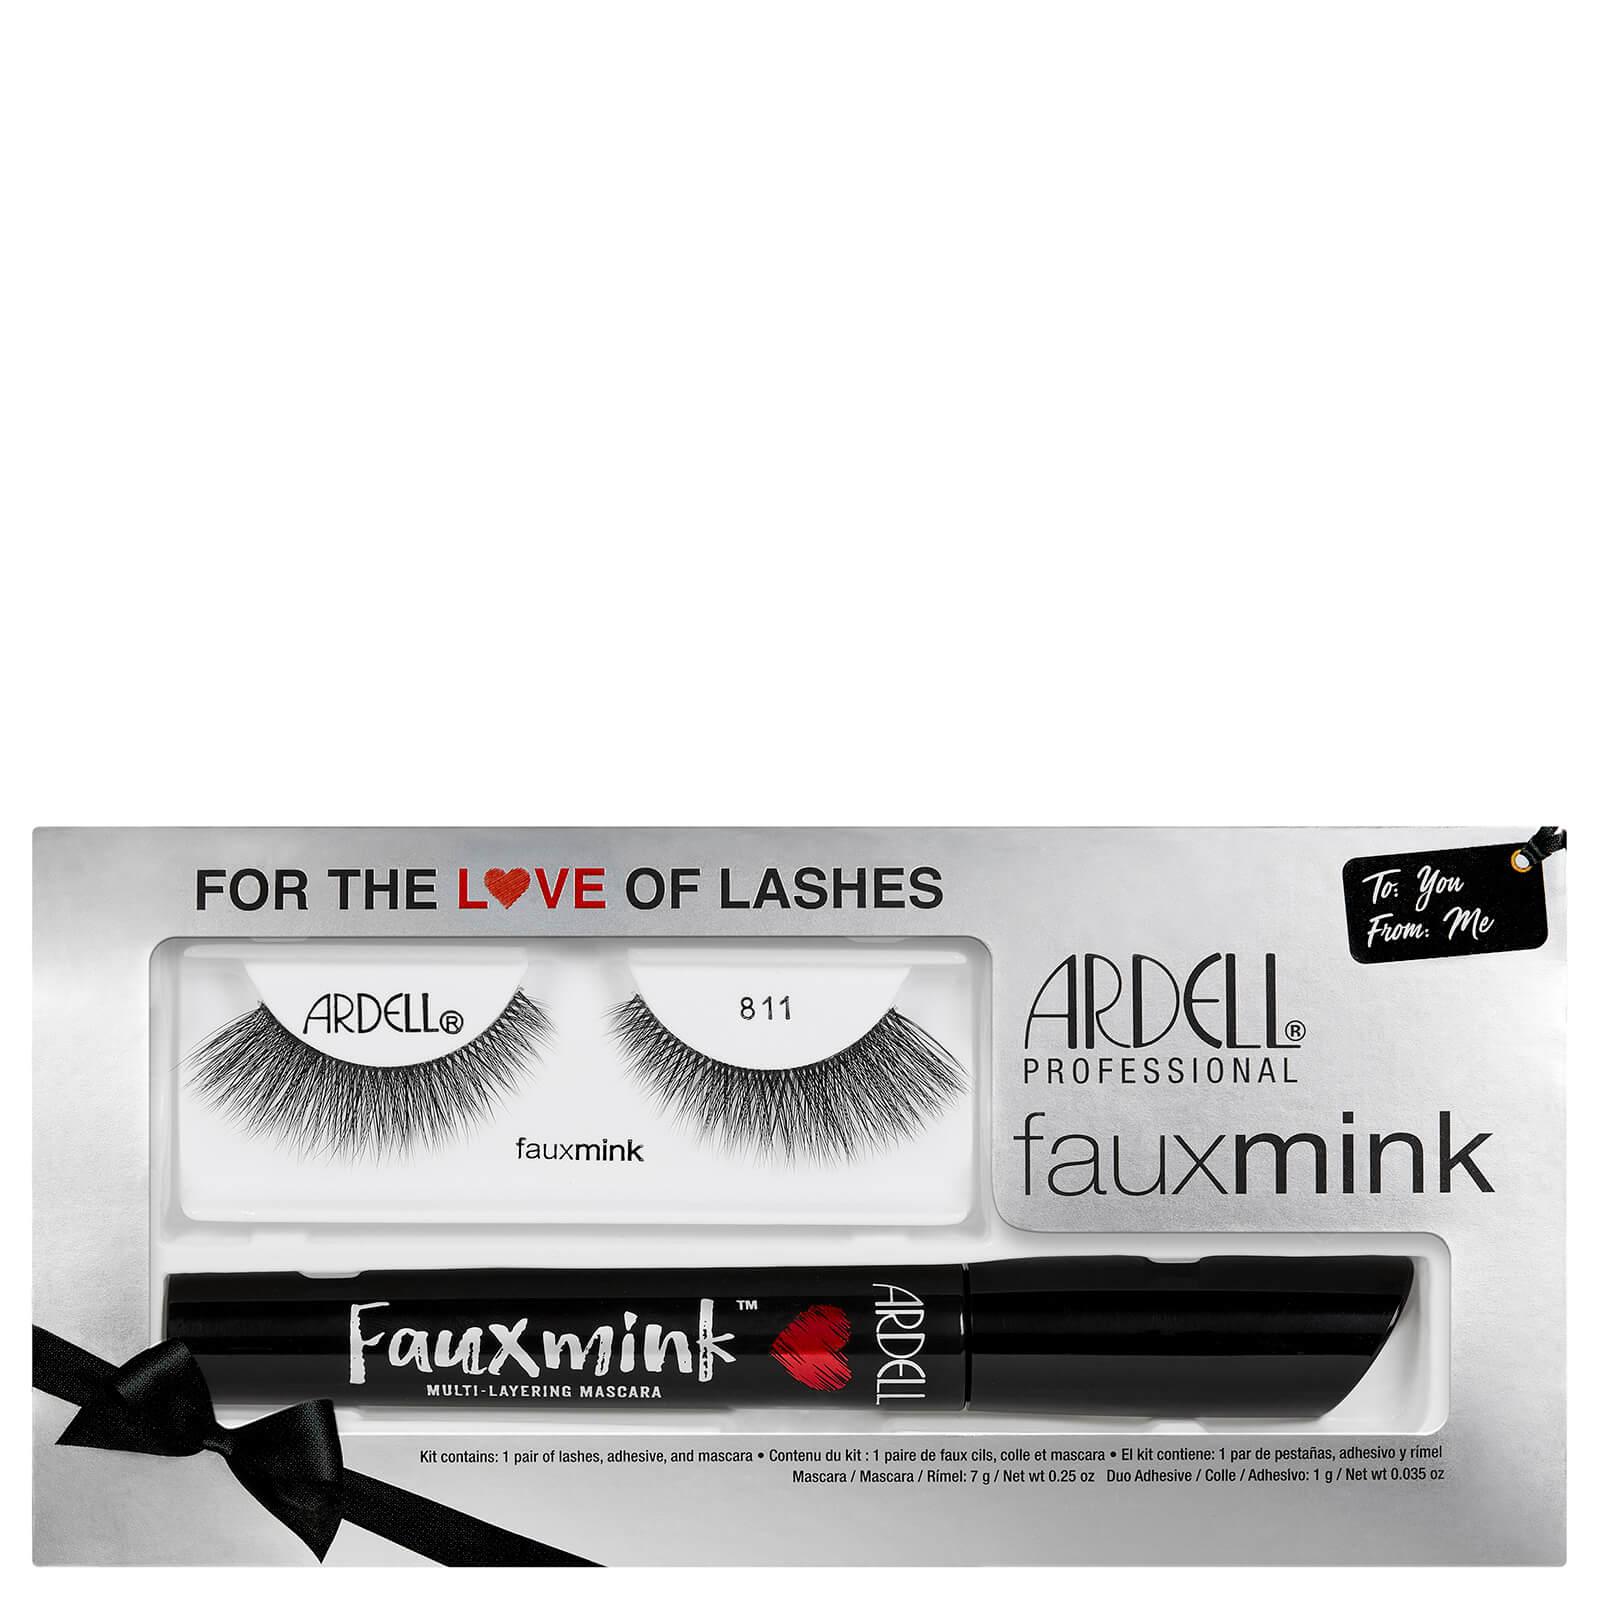 b9bddcaec11 Ardell Faux Mink Mascara & Lash Kit | Free US Shipping | lookfantastic